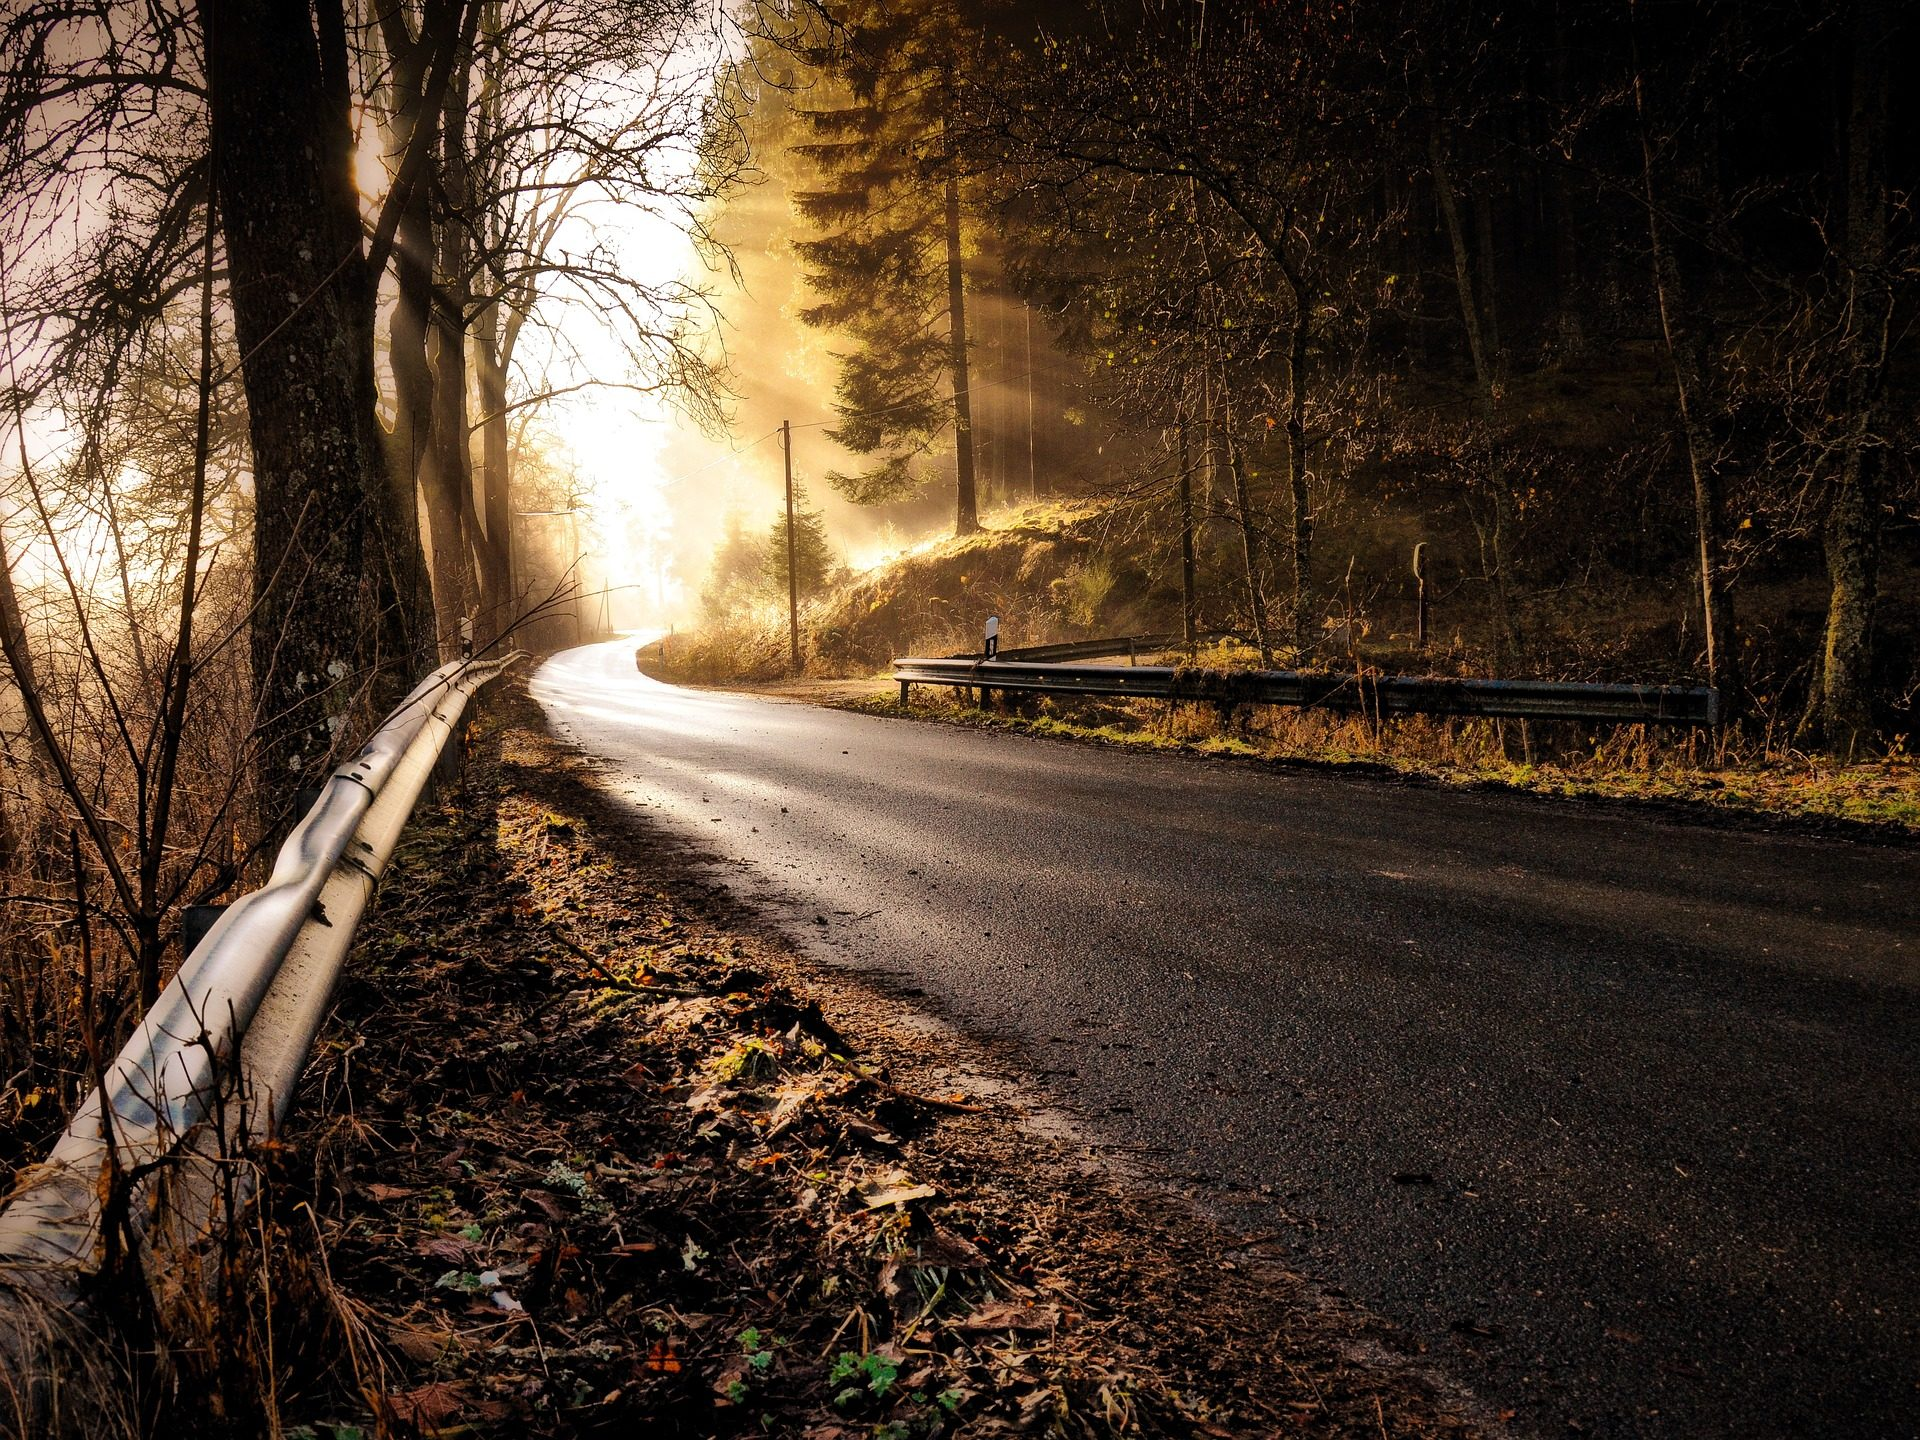 carretera, Straße, Wald, Bäume, Nebel, Halos, Strahlen, Licht, Halbschatten - Wallpaper HD - Prof.-falken.com